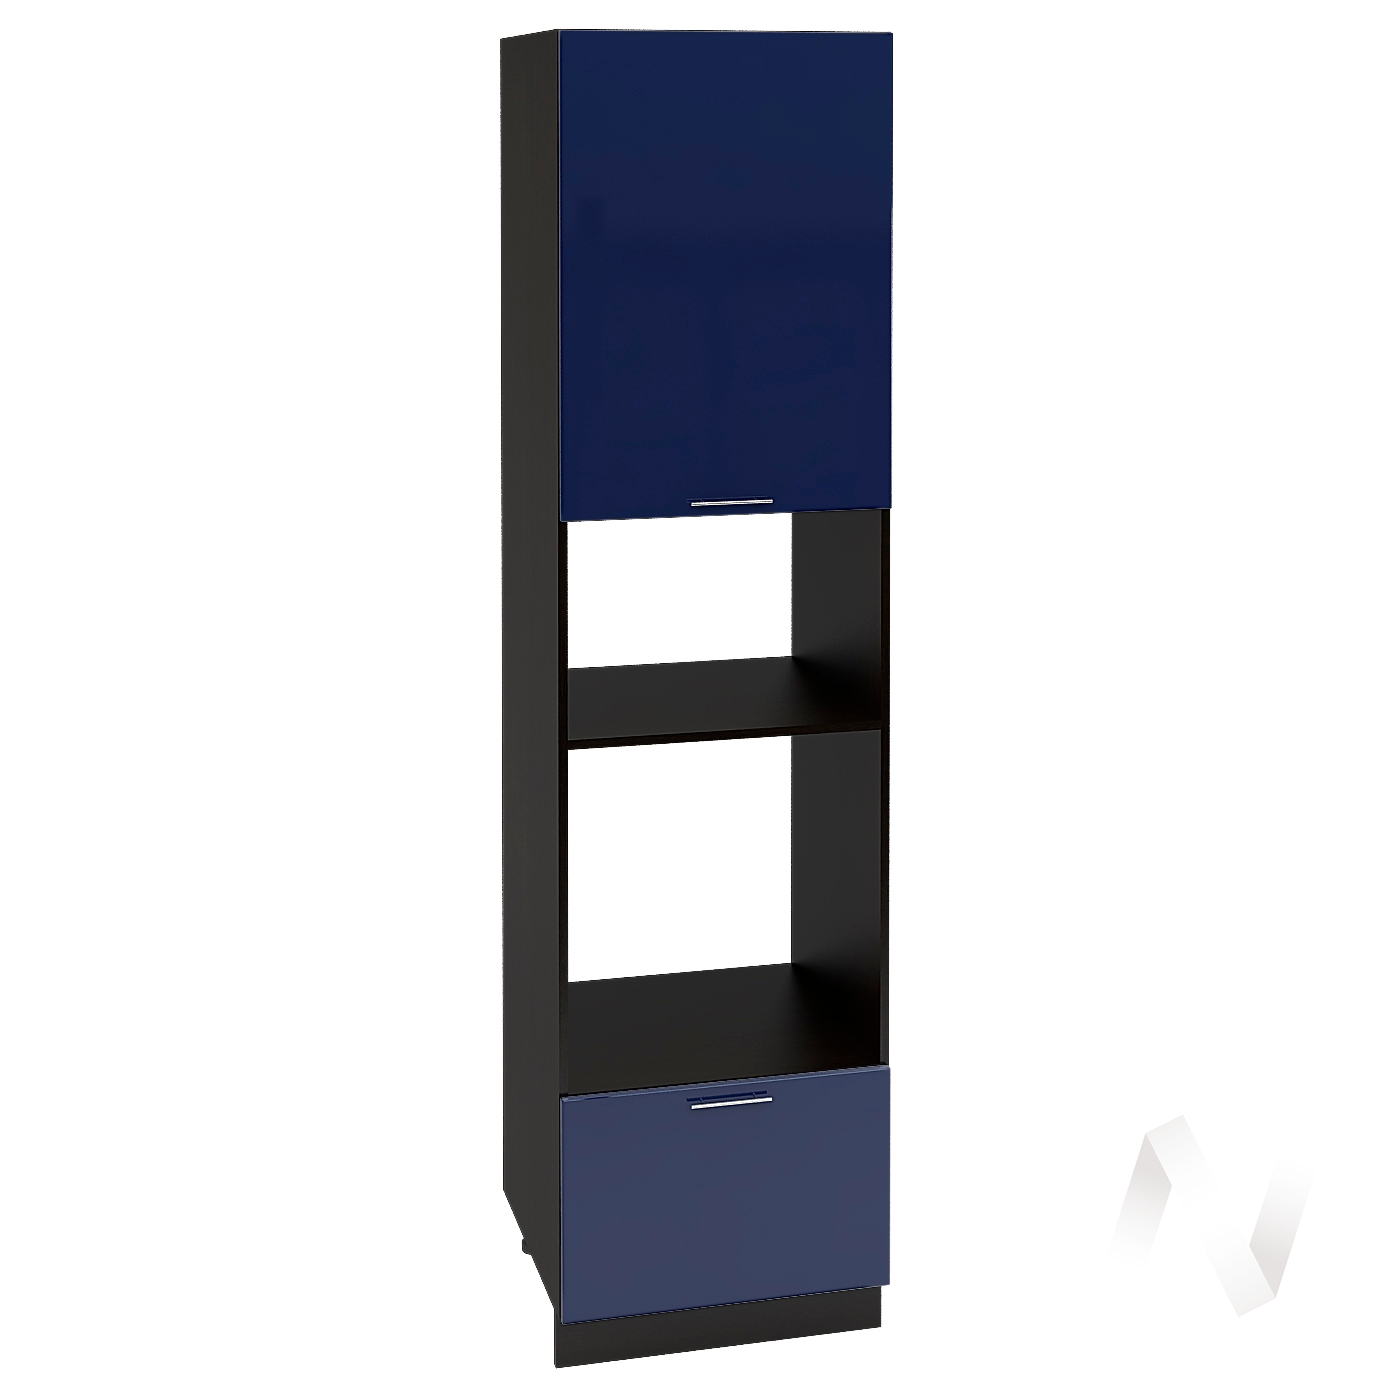 "Кухня ""Валерия-М"": Шкаф пенал 606, ШП 606НМ (Синий глянец/корпус венге)"